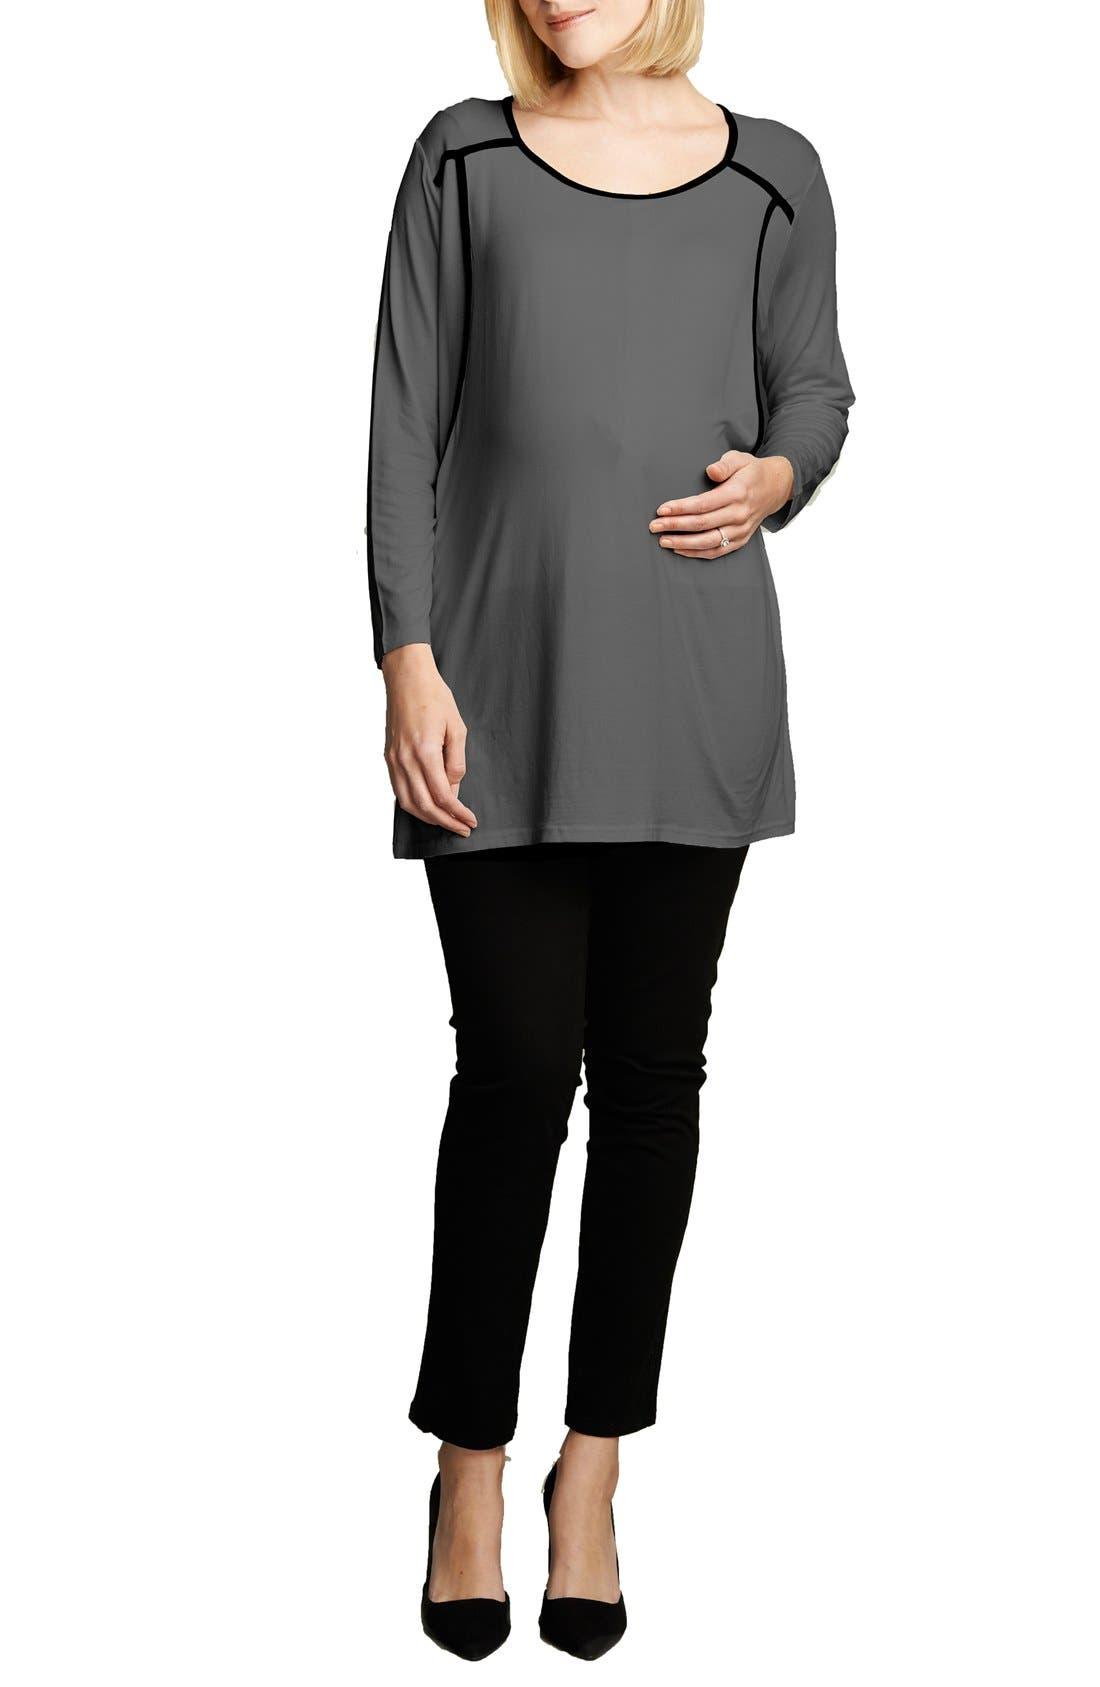 Long Sleeve Nursing Top,                             Main thumbnail 1, color,                             CHARCOAL/BLACK